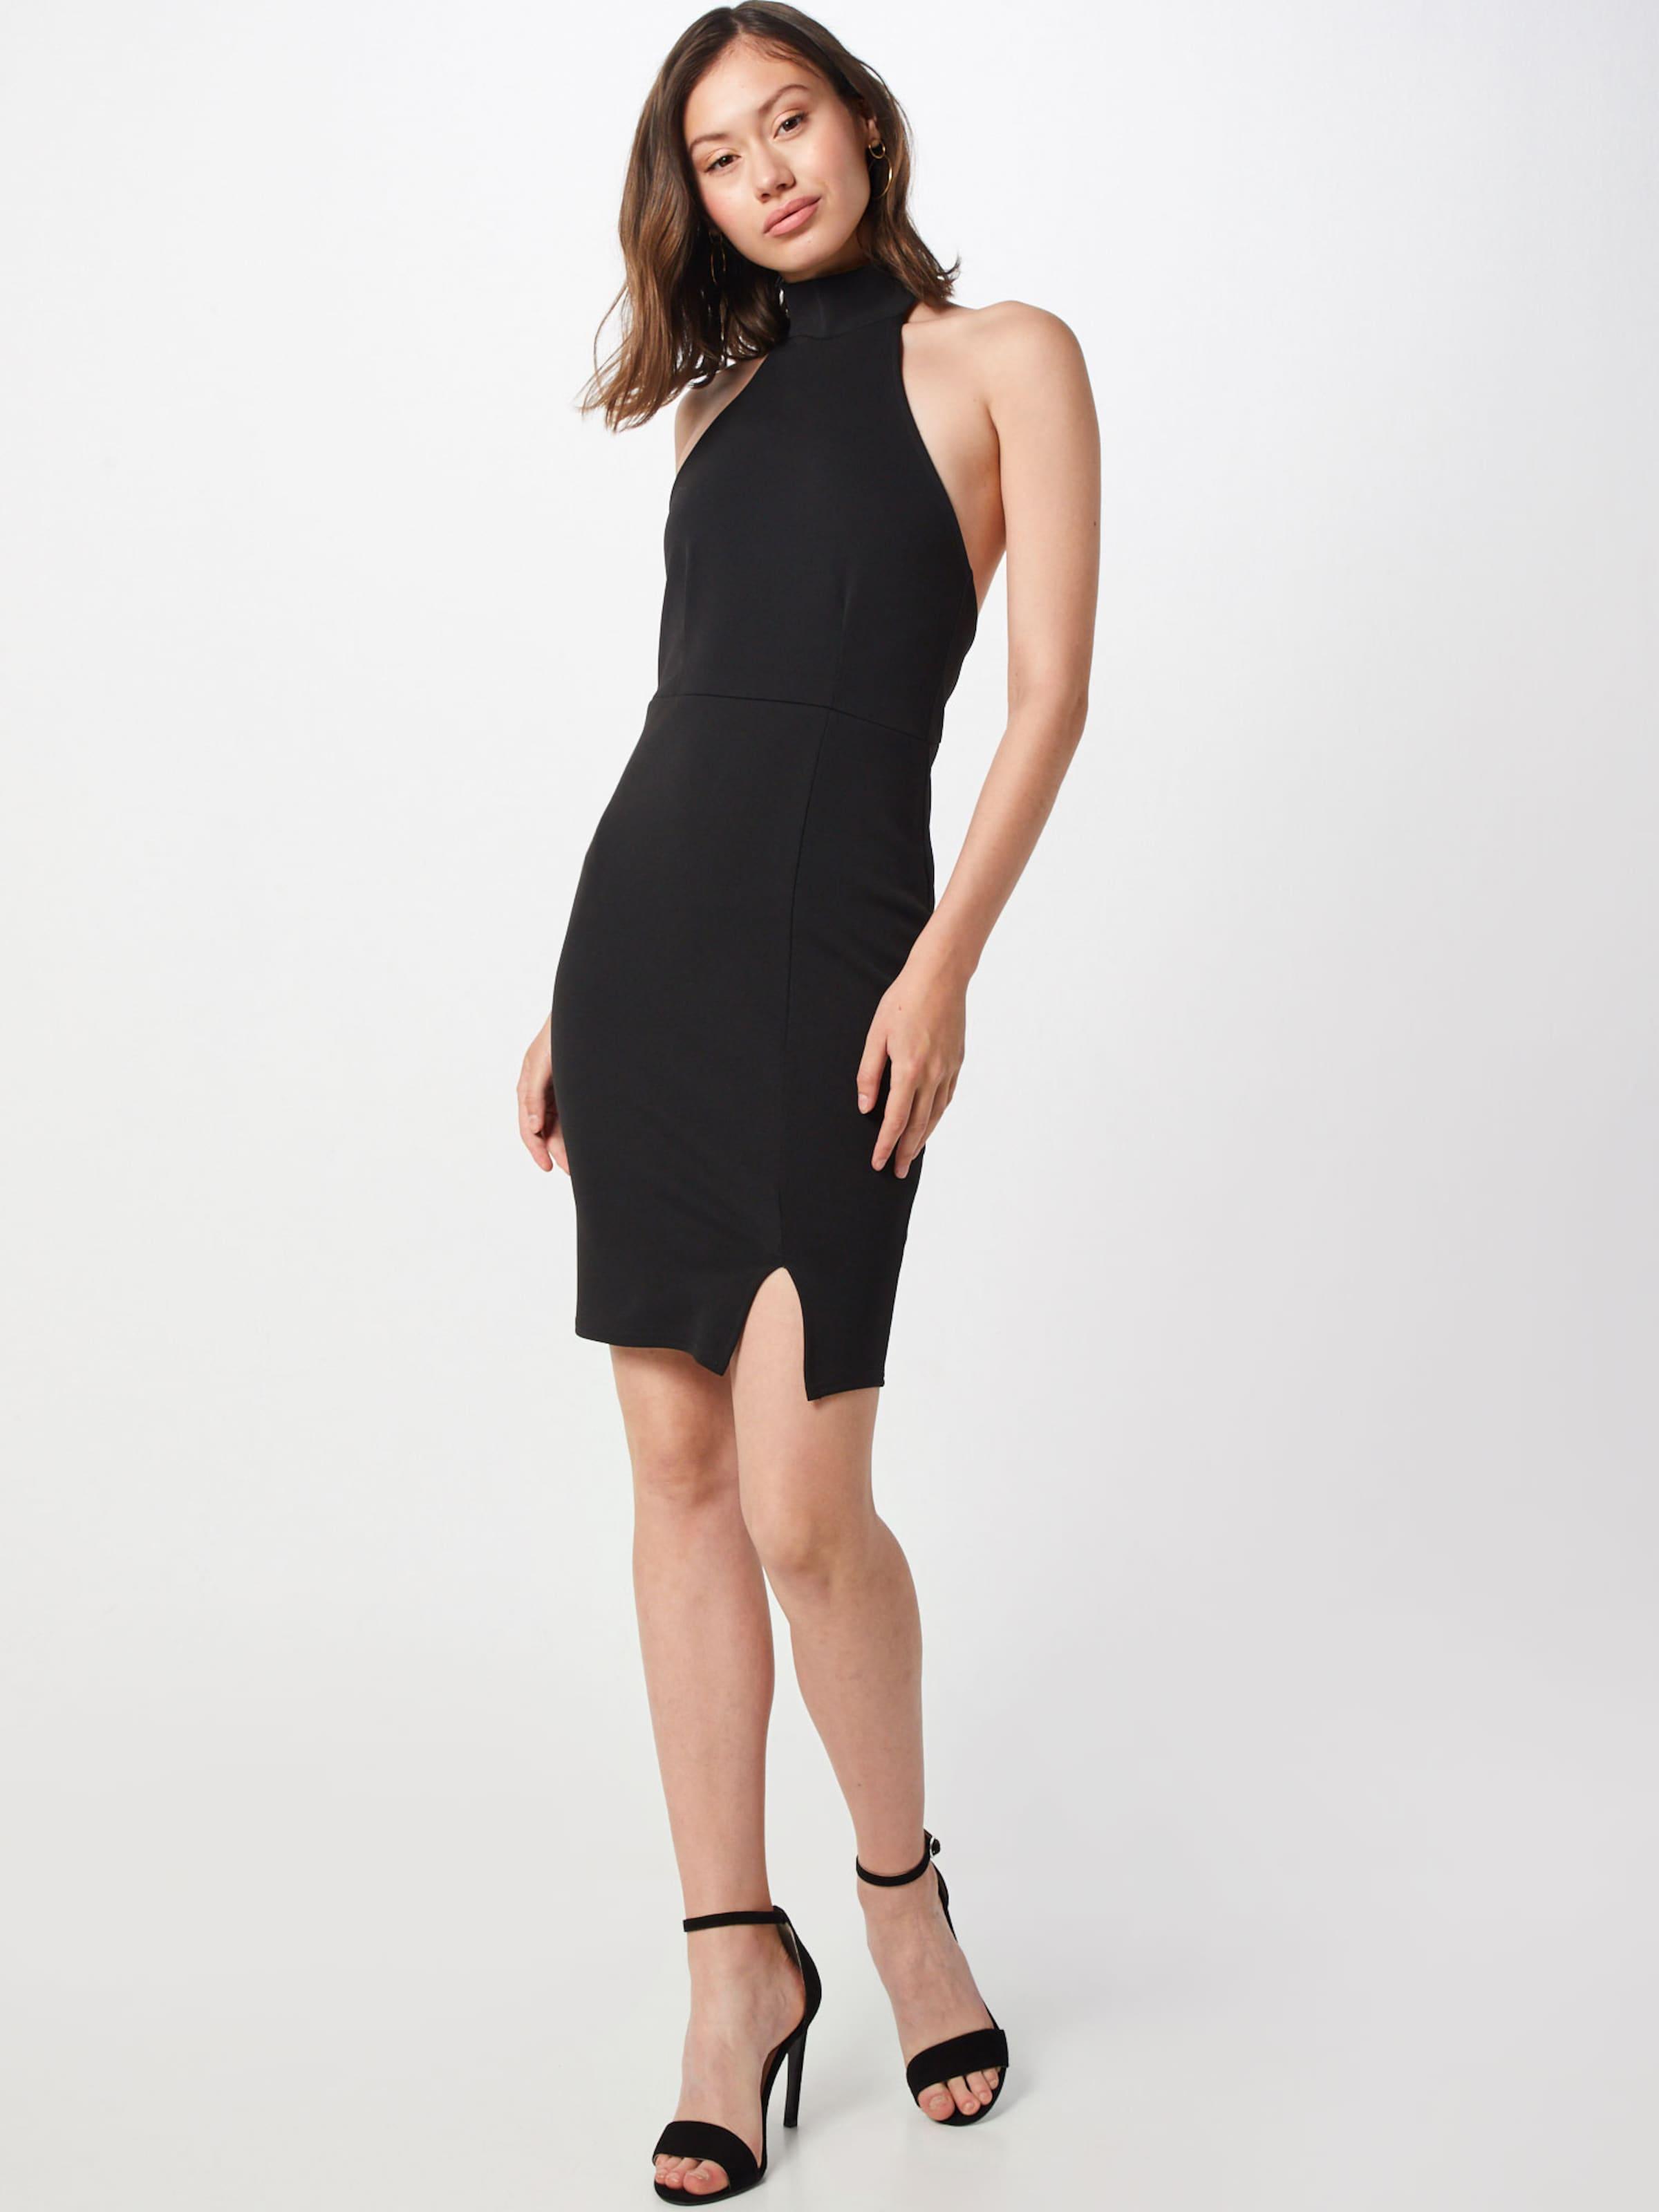 Kleid Schwarz Missguided Dress' Mini 'choker In Ib76gYfyv